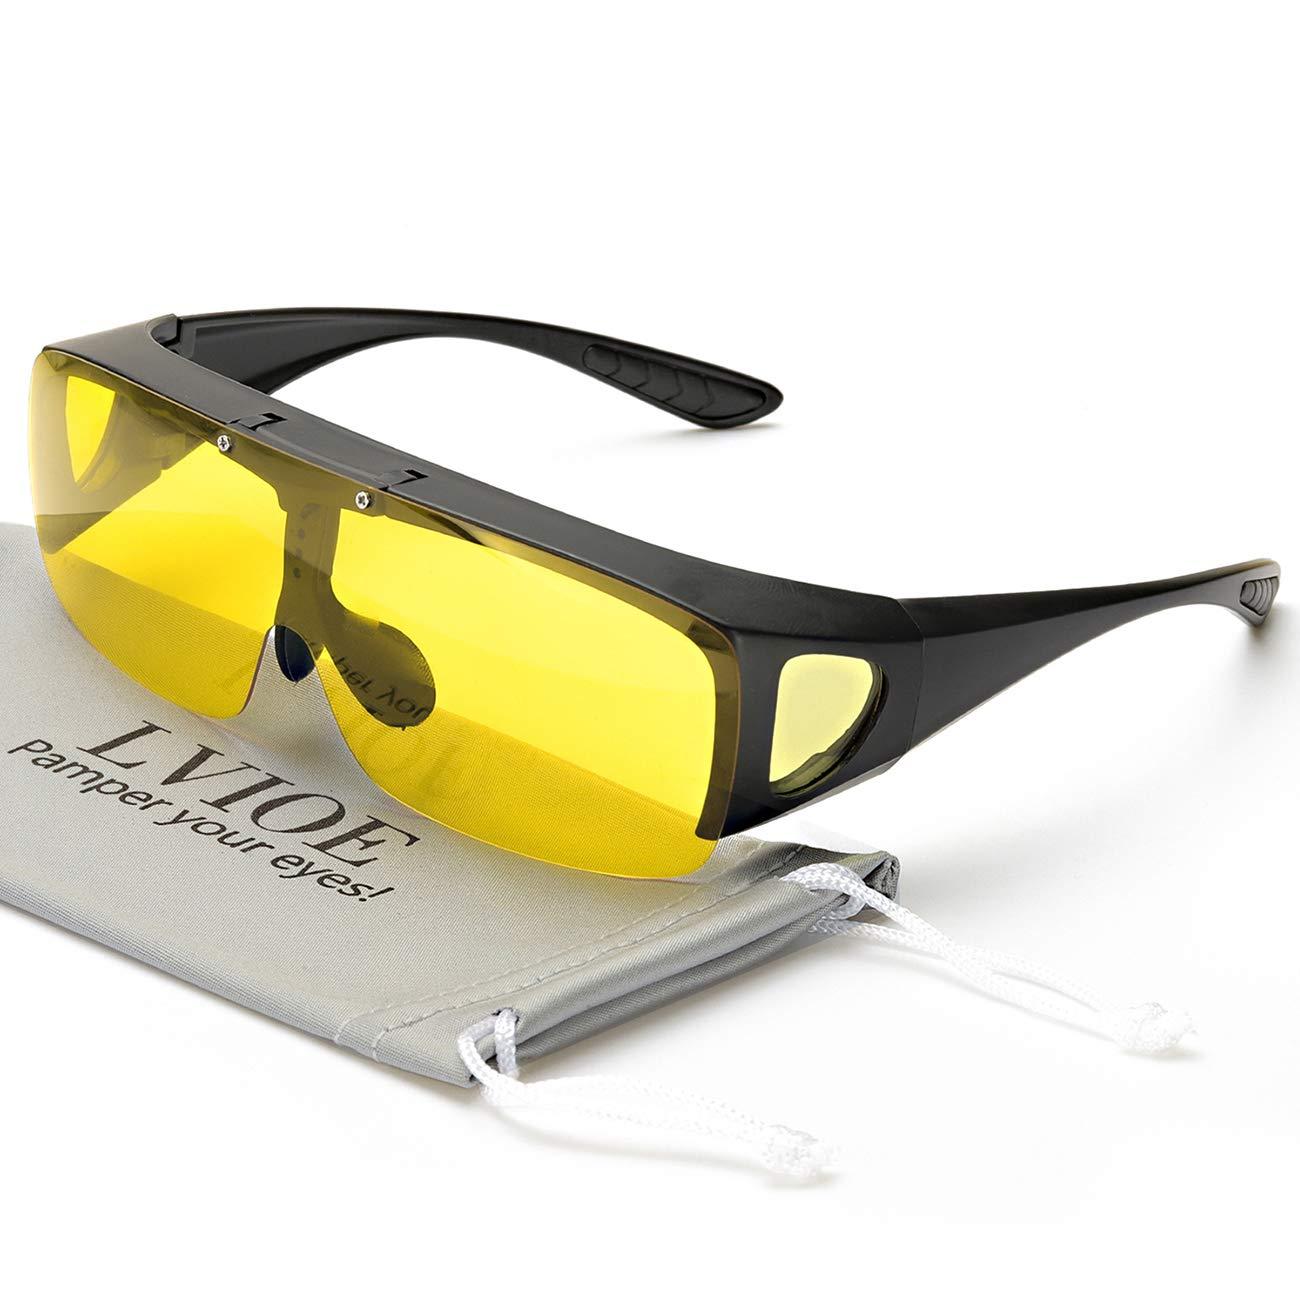 LVIOE Oversized Night Vision Glasses Fit Over Regular Prescription Glasses with Flip Up Polarized Lens Wrap Around Style